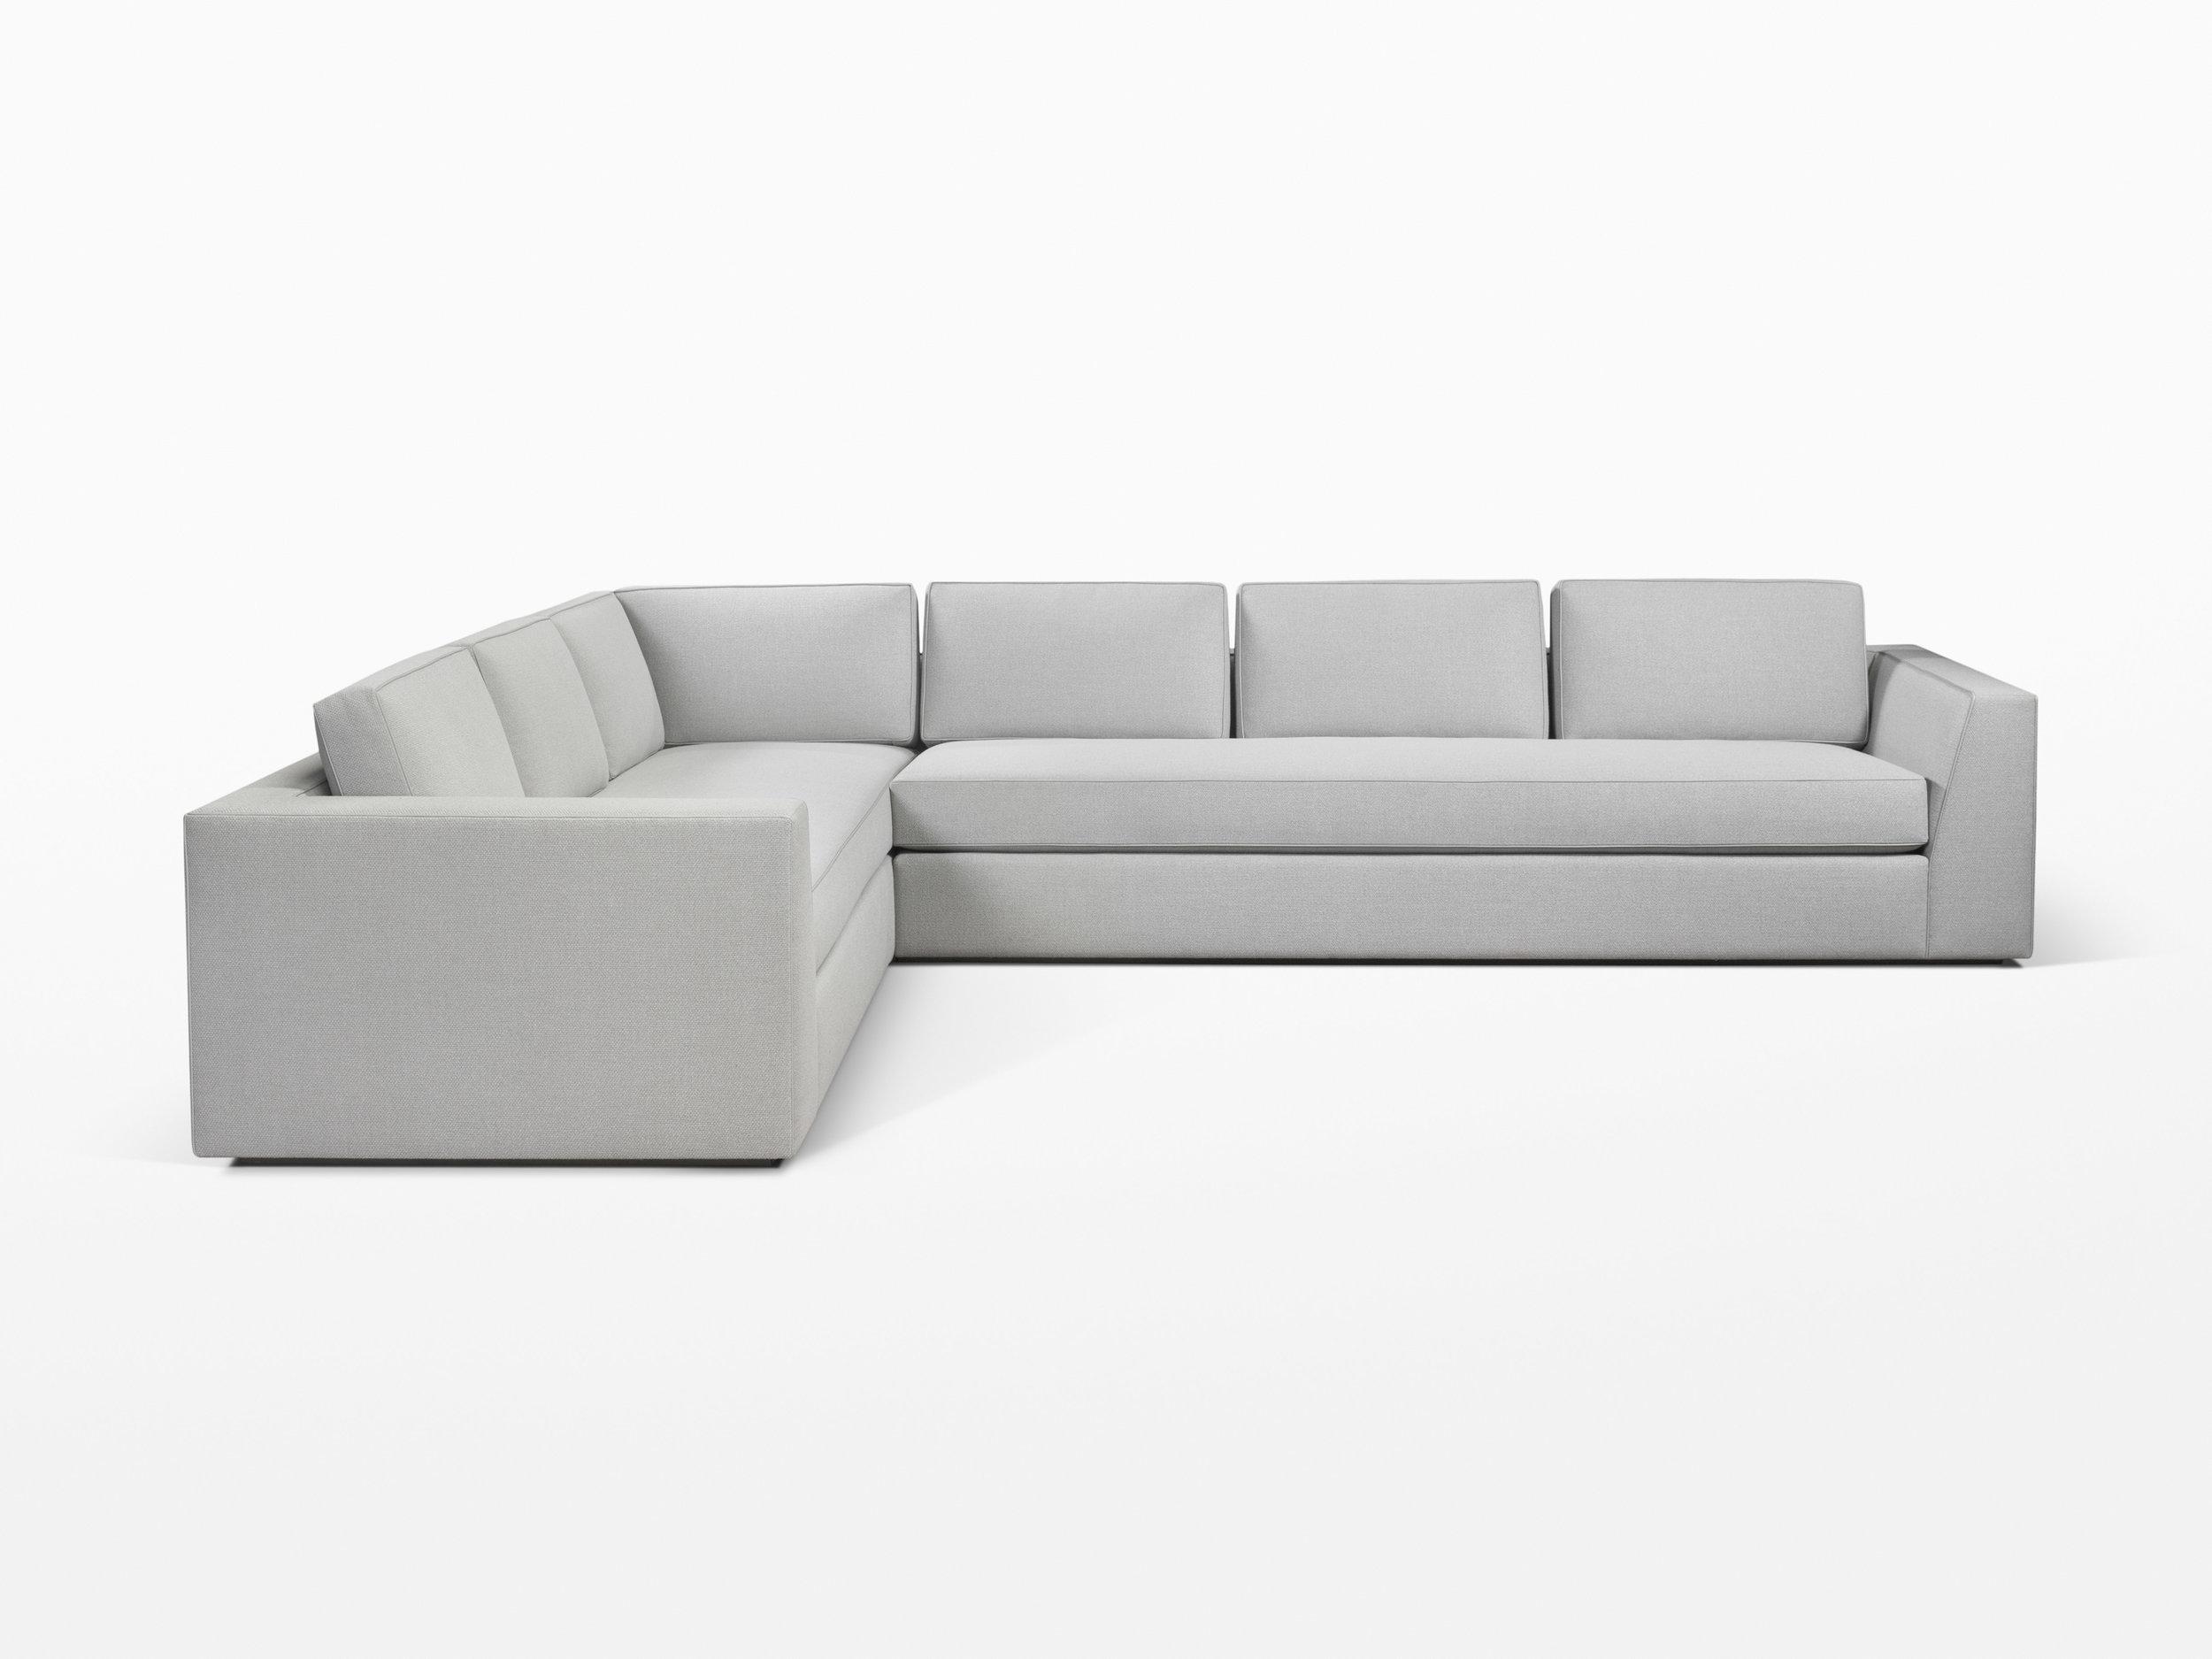 custom sectional sofa reclining sofas under 1000 004 chai ming studios cms 1 jpg